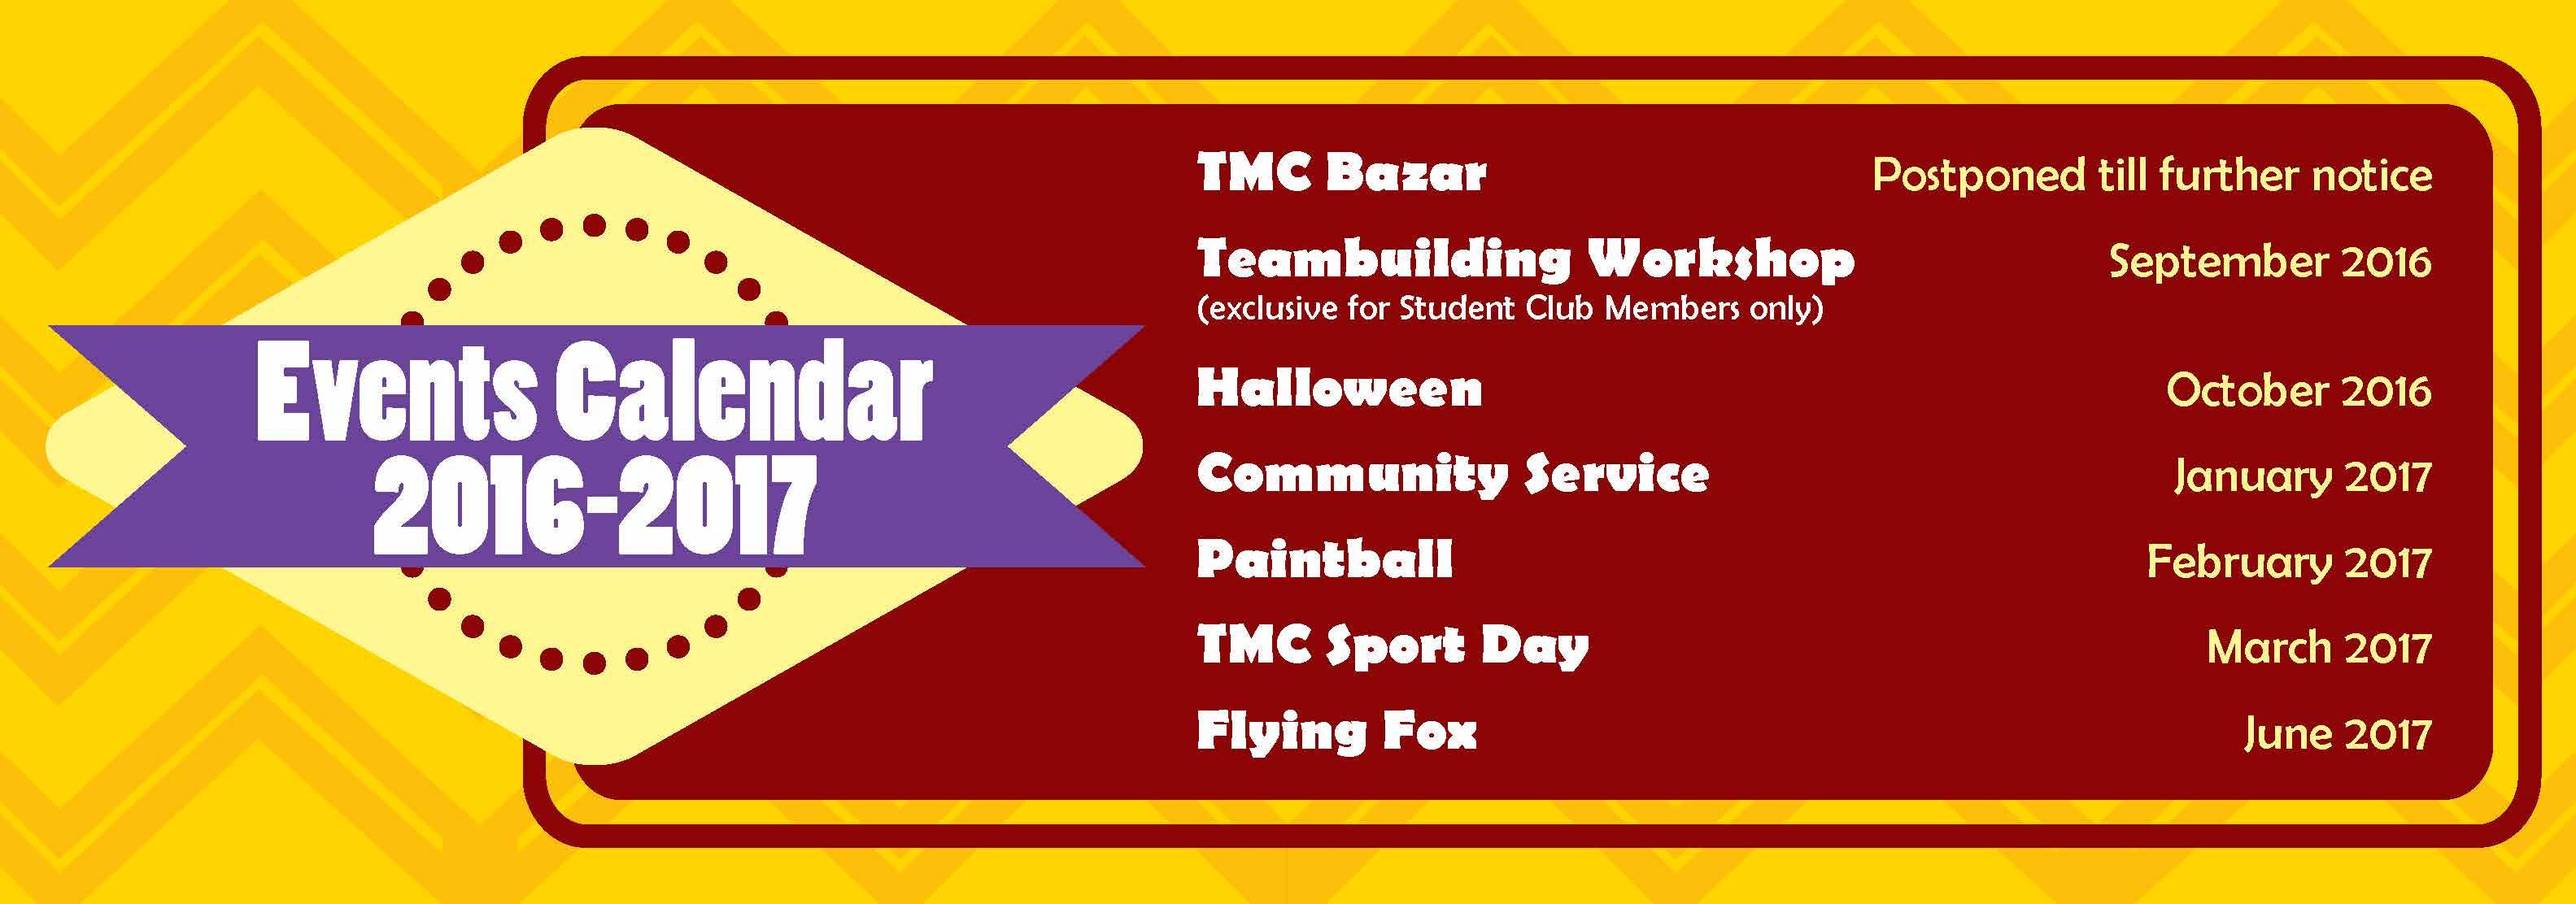 TMC Events Calendar 2016-2017